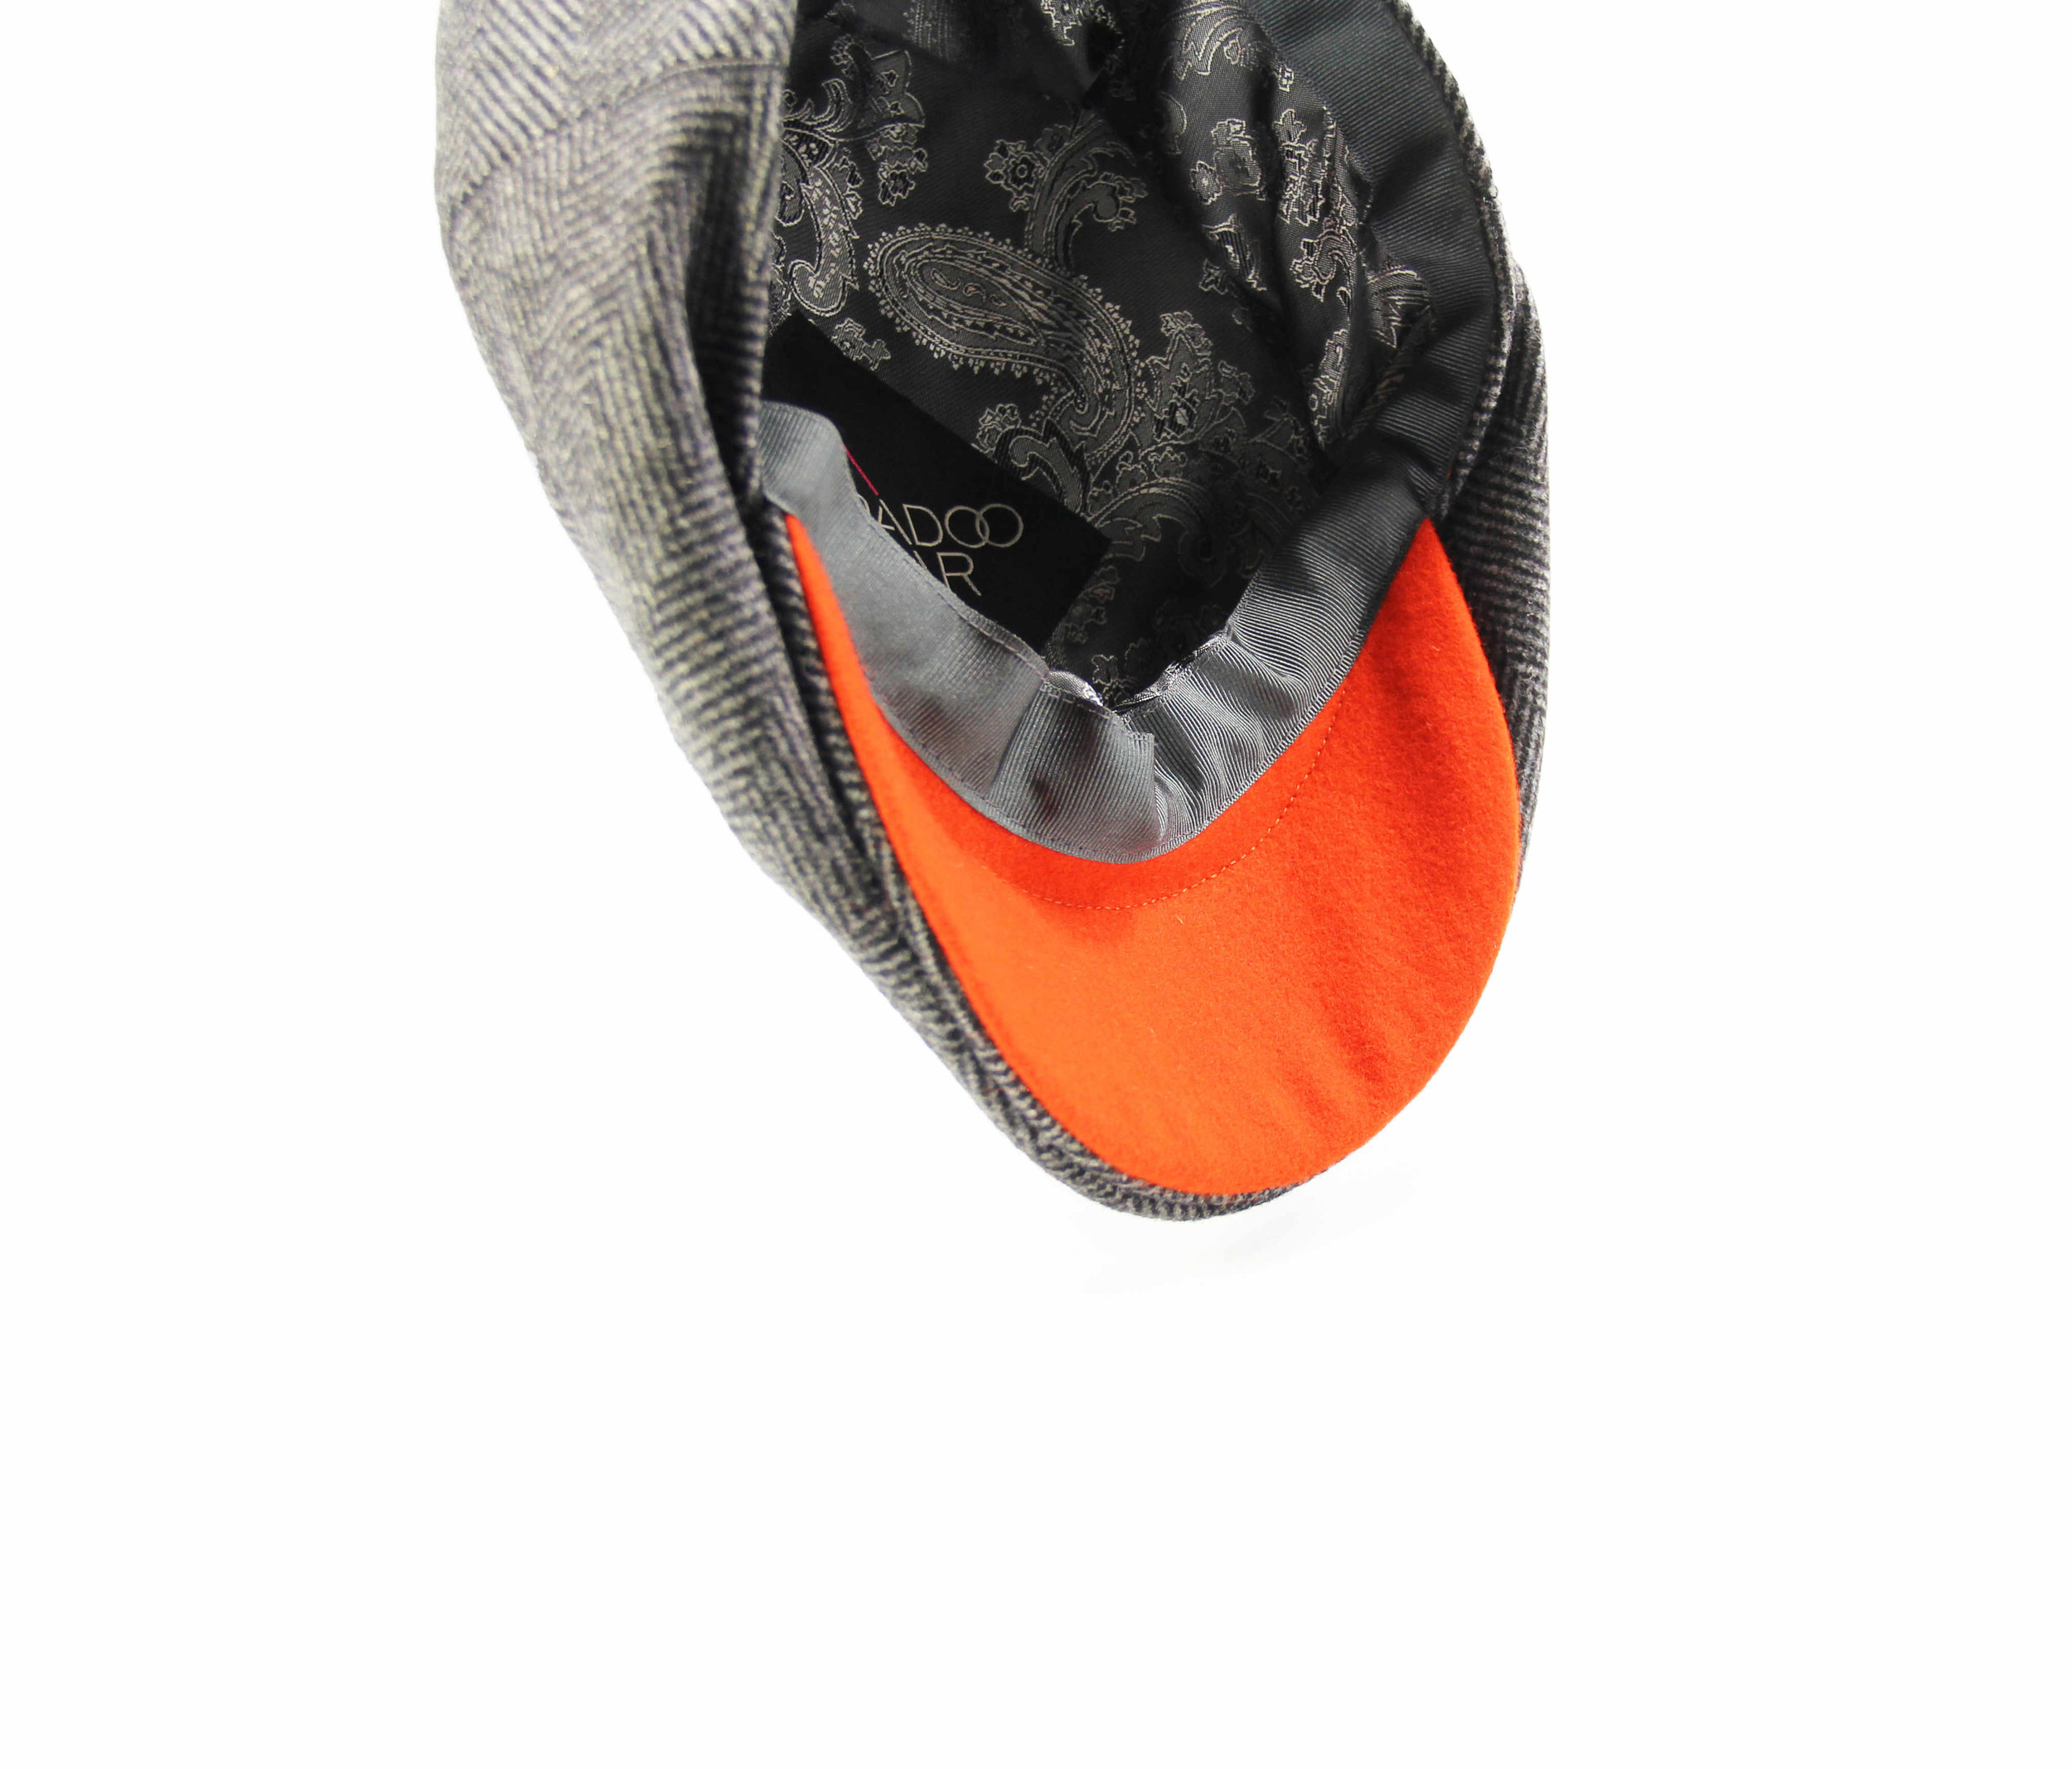 THE 'DRIFTER' GREY AND ORANGE FLAT CAP